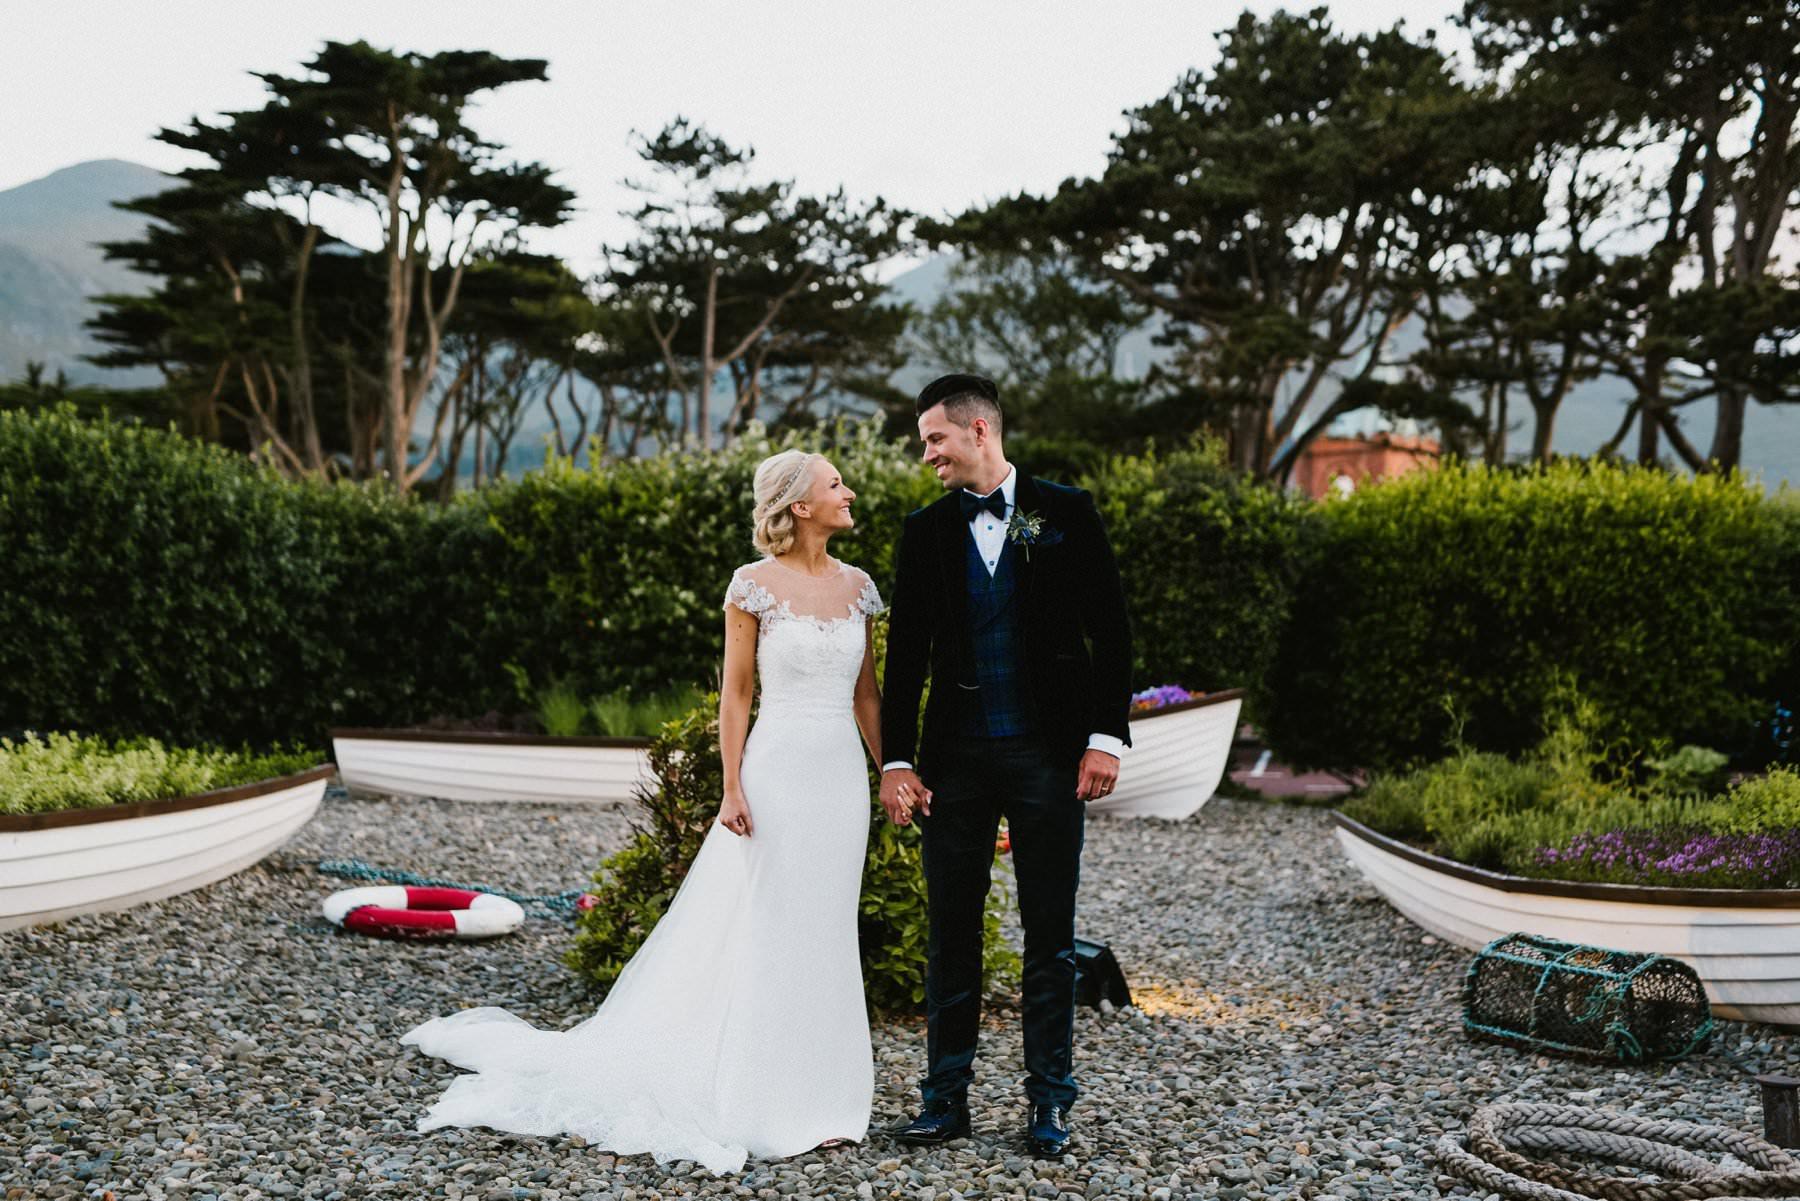 slieve donard wedding photographer